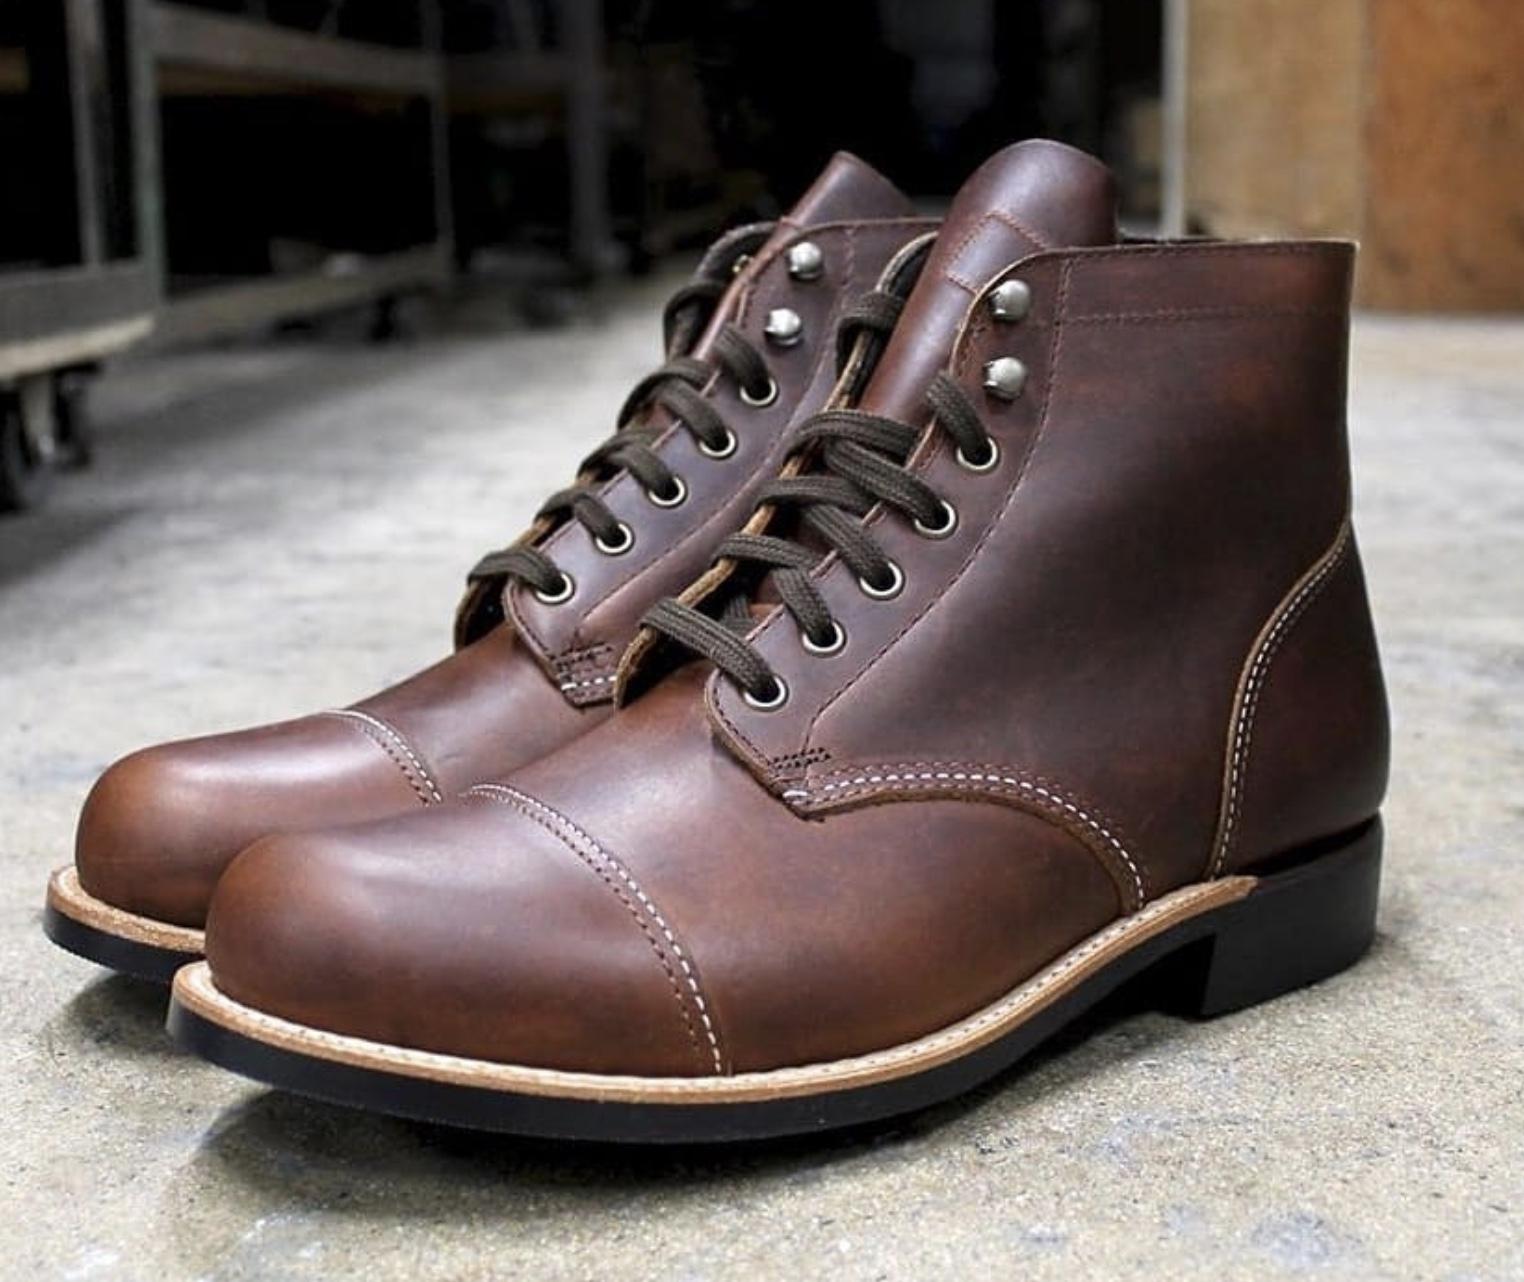 canada west romeo boot